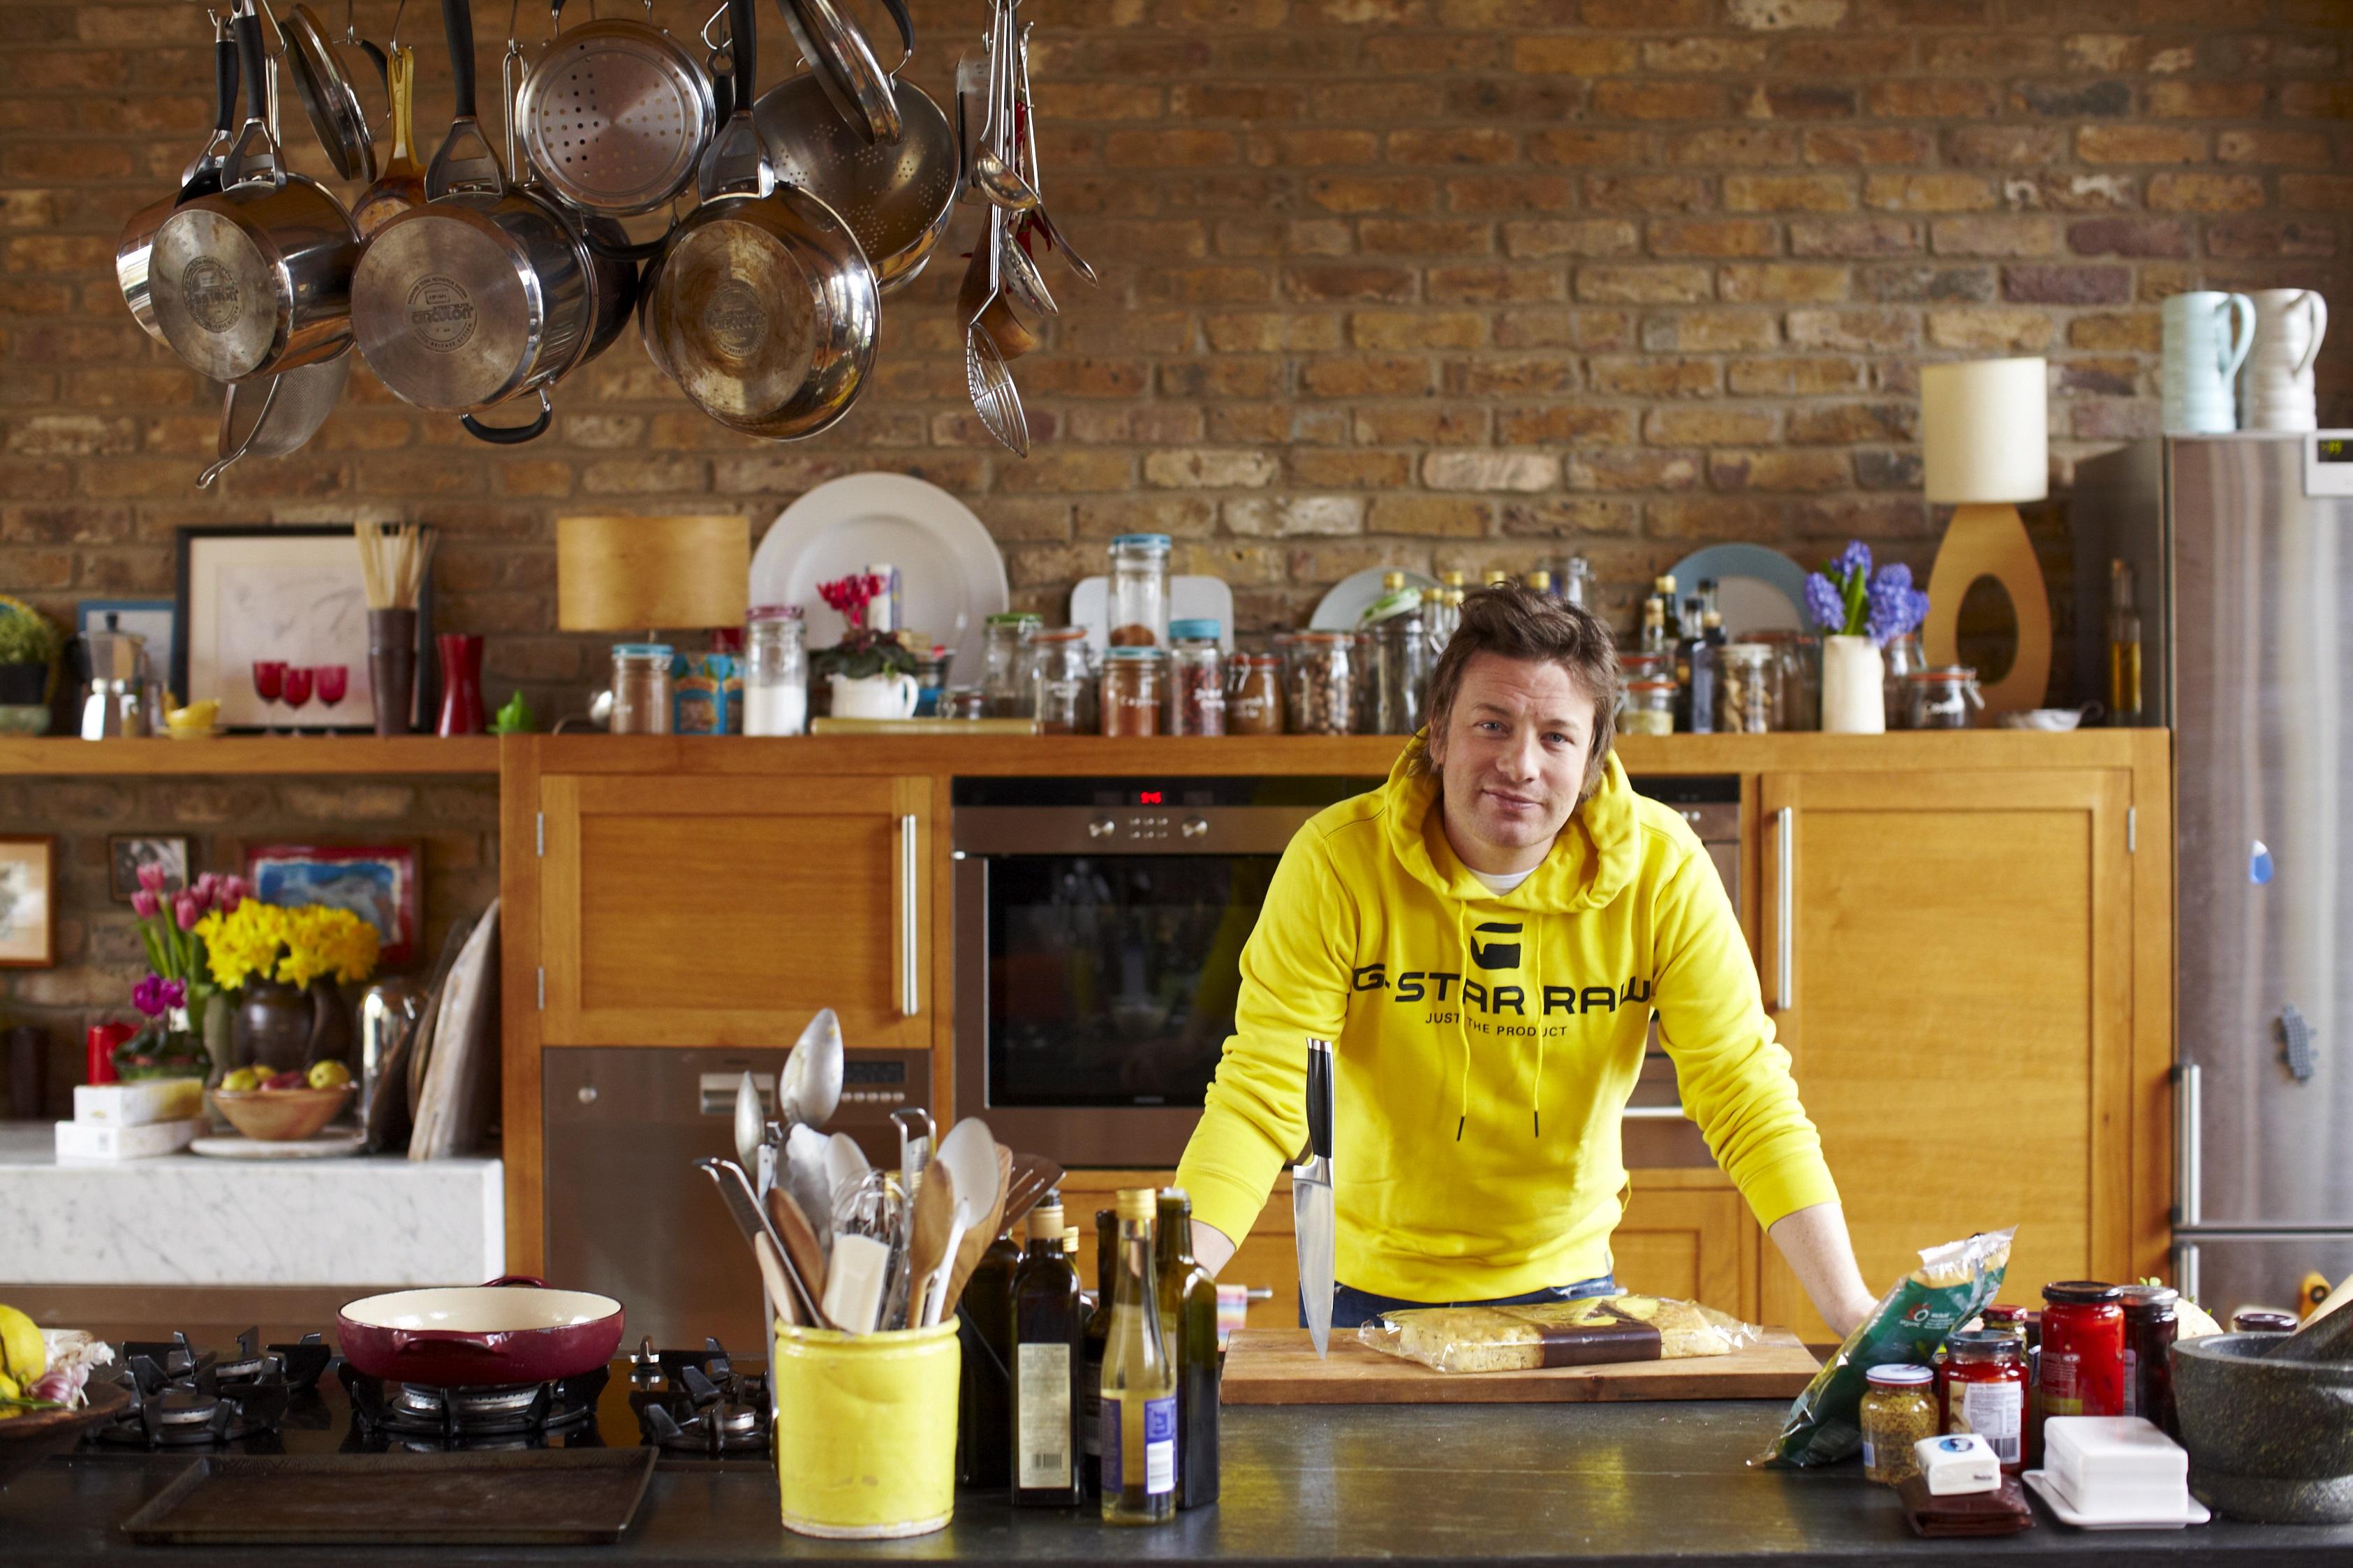 Рецепты от джейми оливера обед за 30 минут 25 фотография